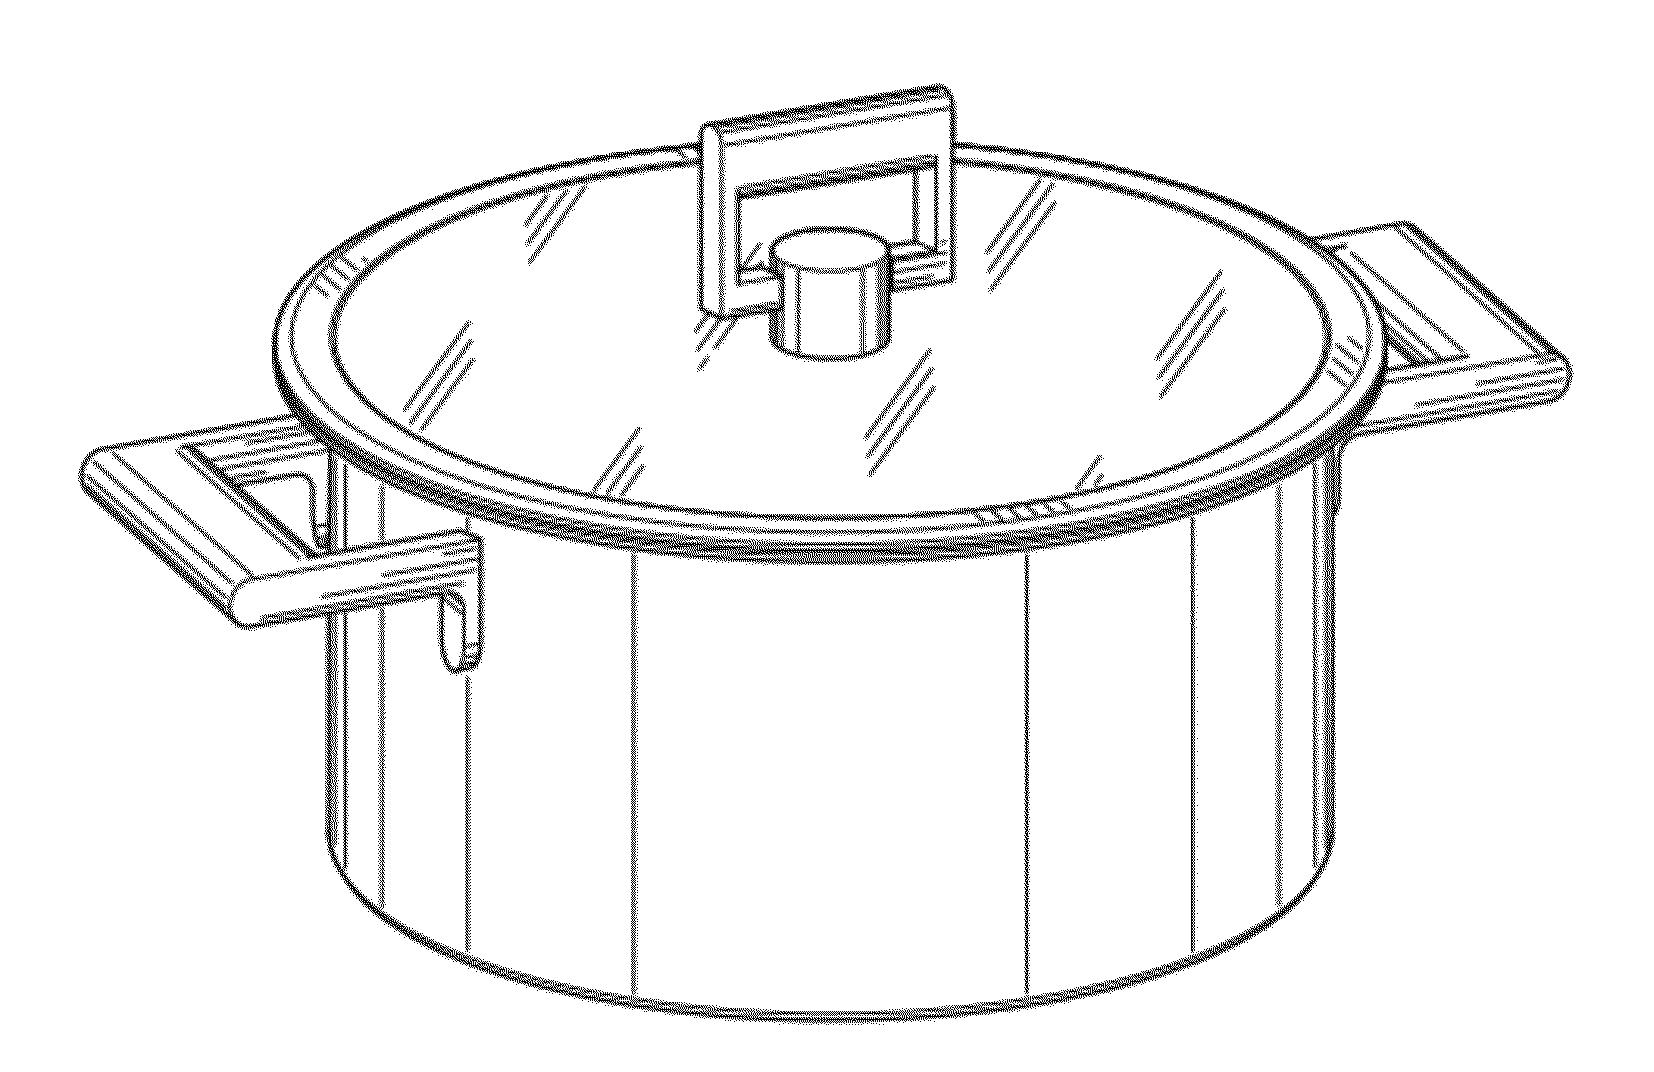 Cooking Pan Drawing Sketch Coloring Page